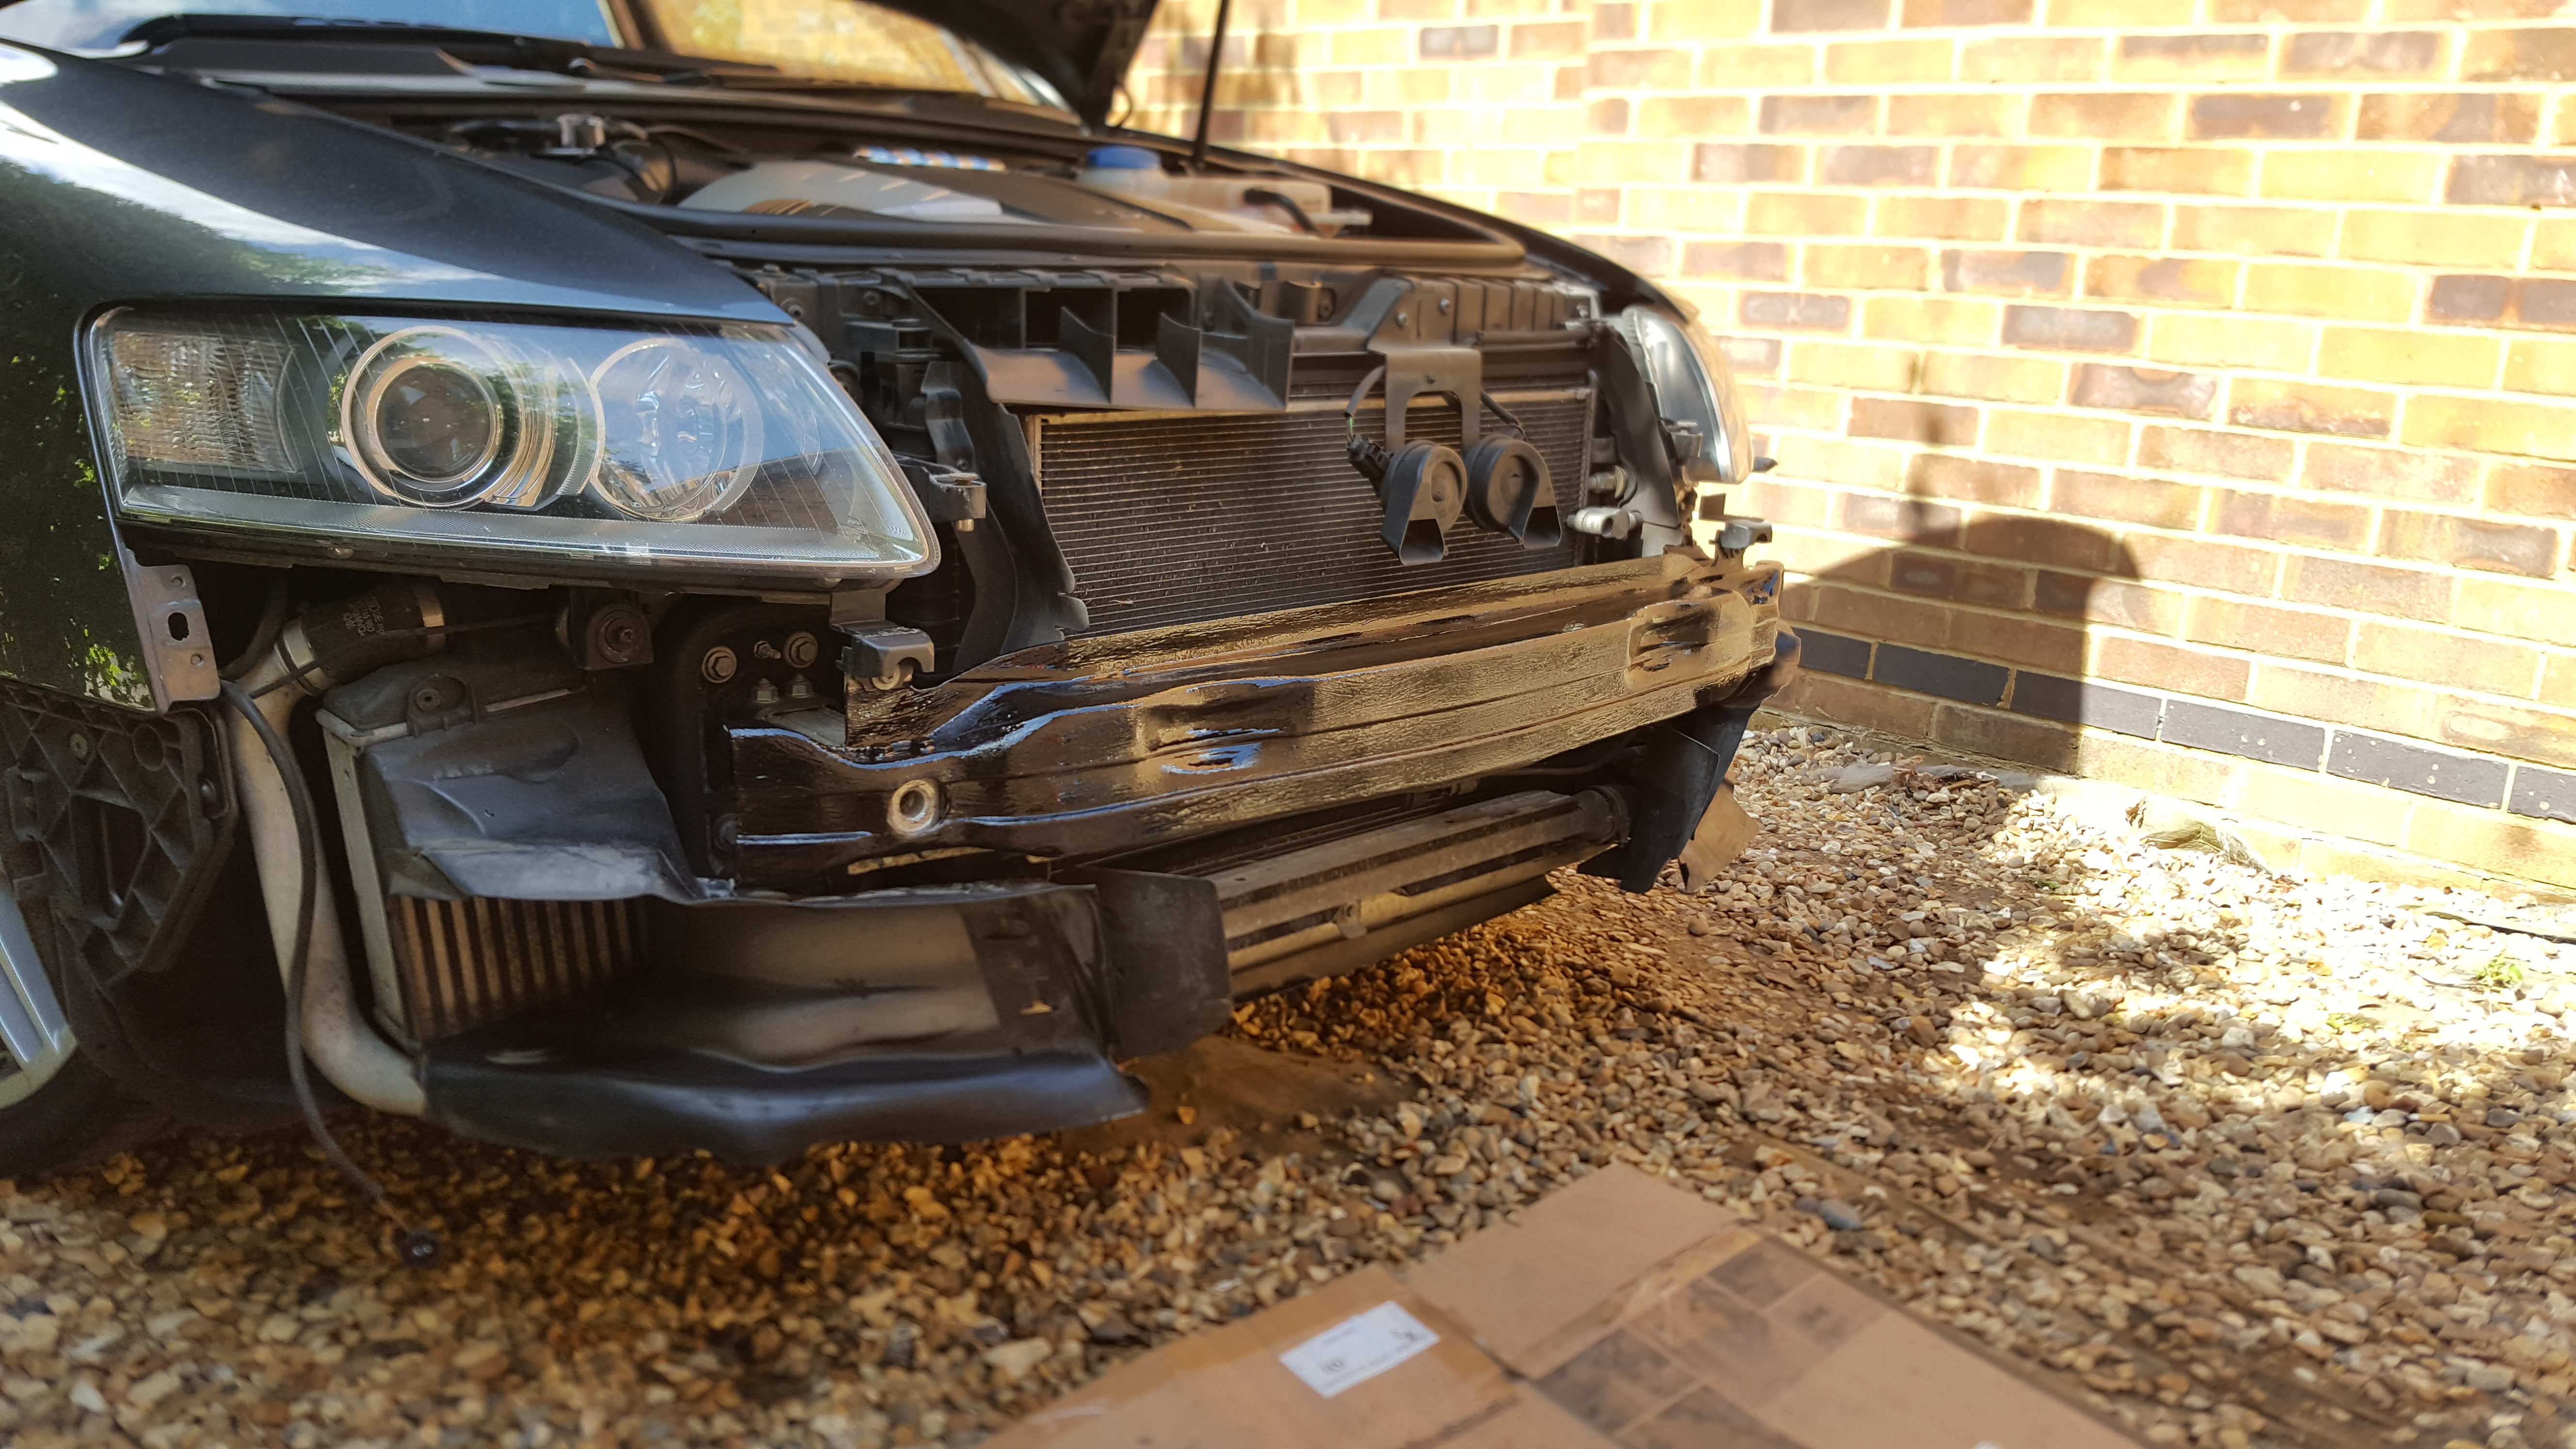 Honeycomb grill swap a6 c6 - Audi A6 (C6) Forum - Audi